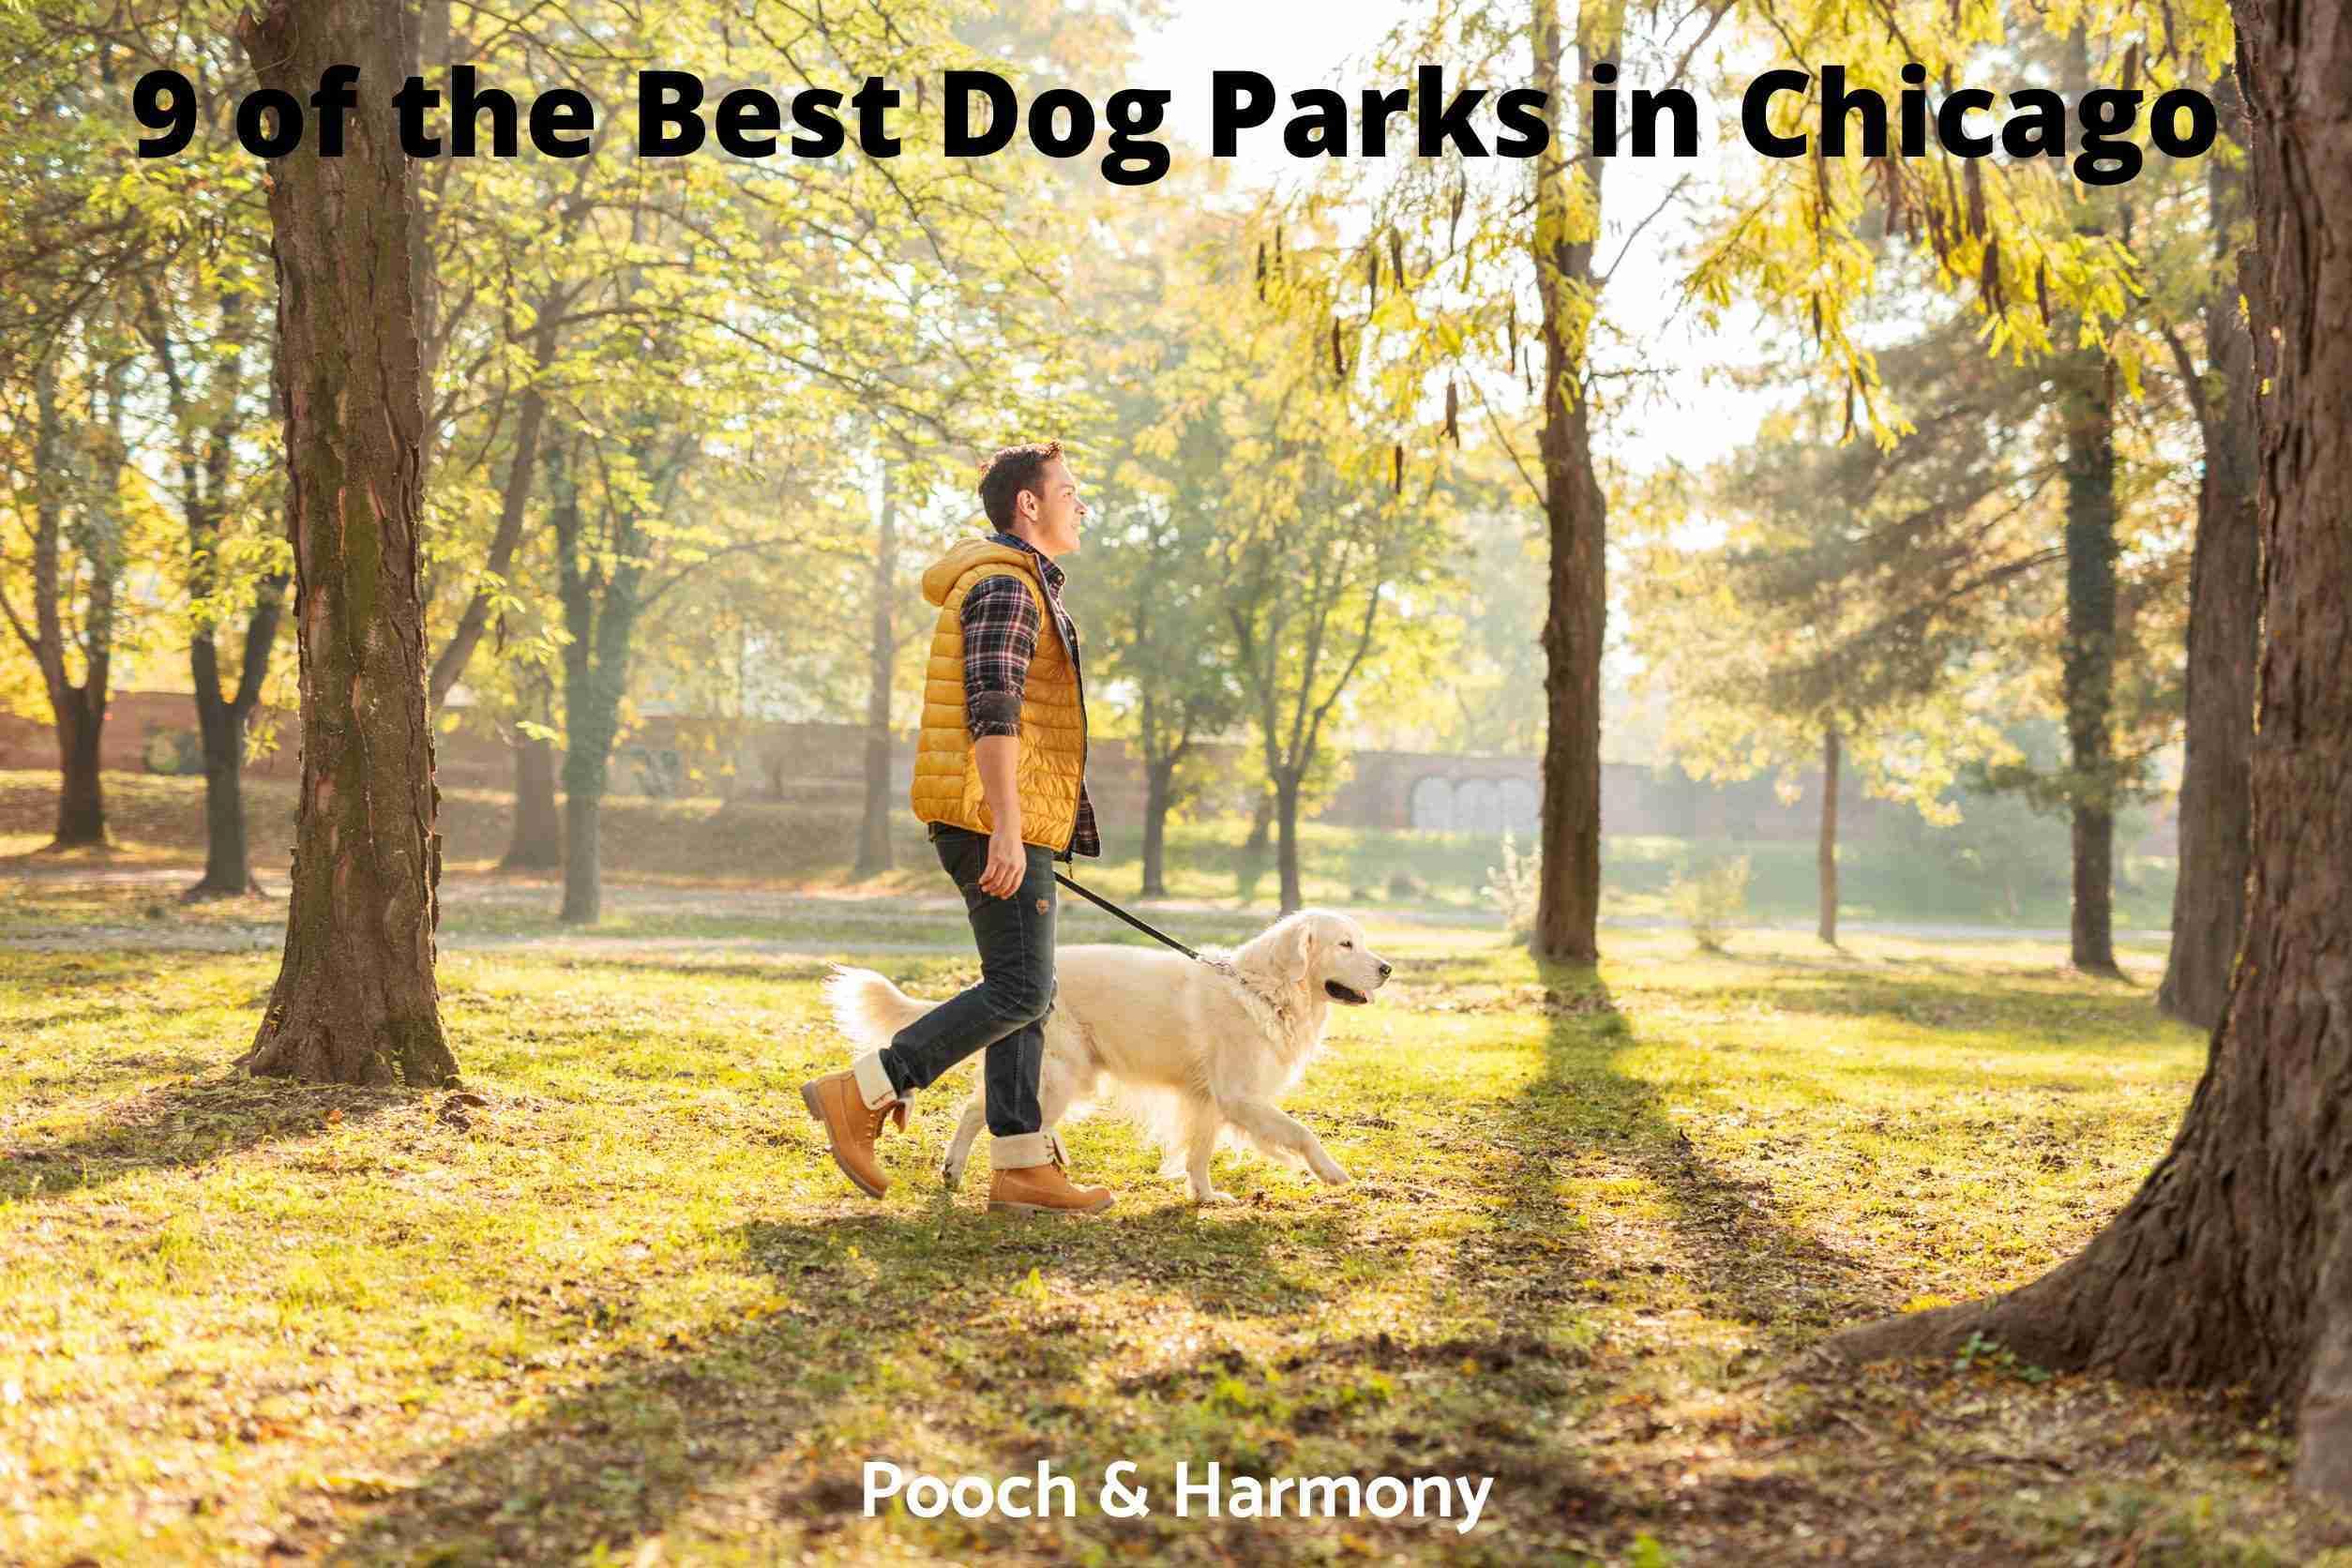 Best Dog Parks in Chicago